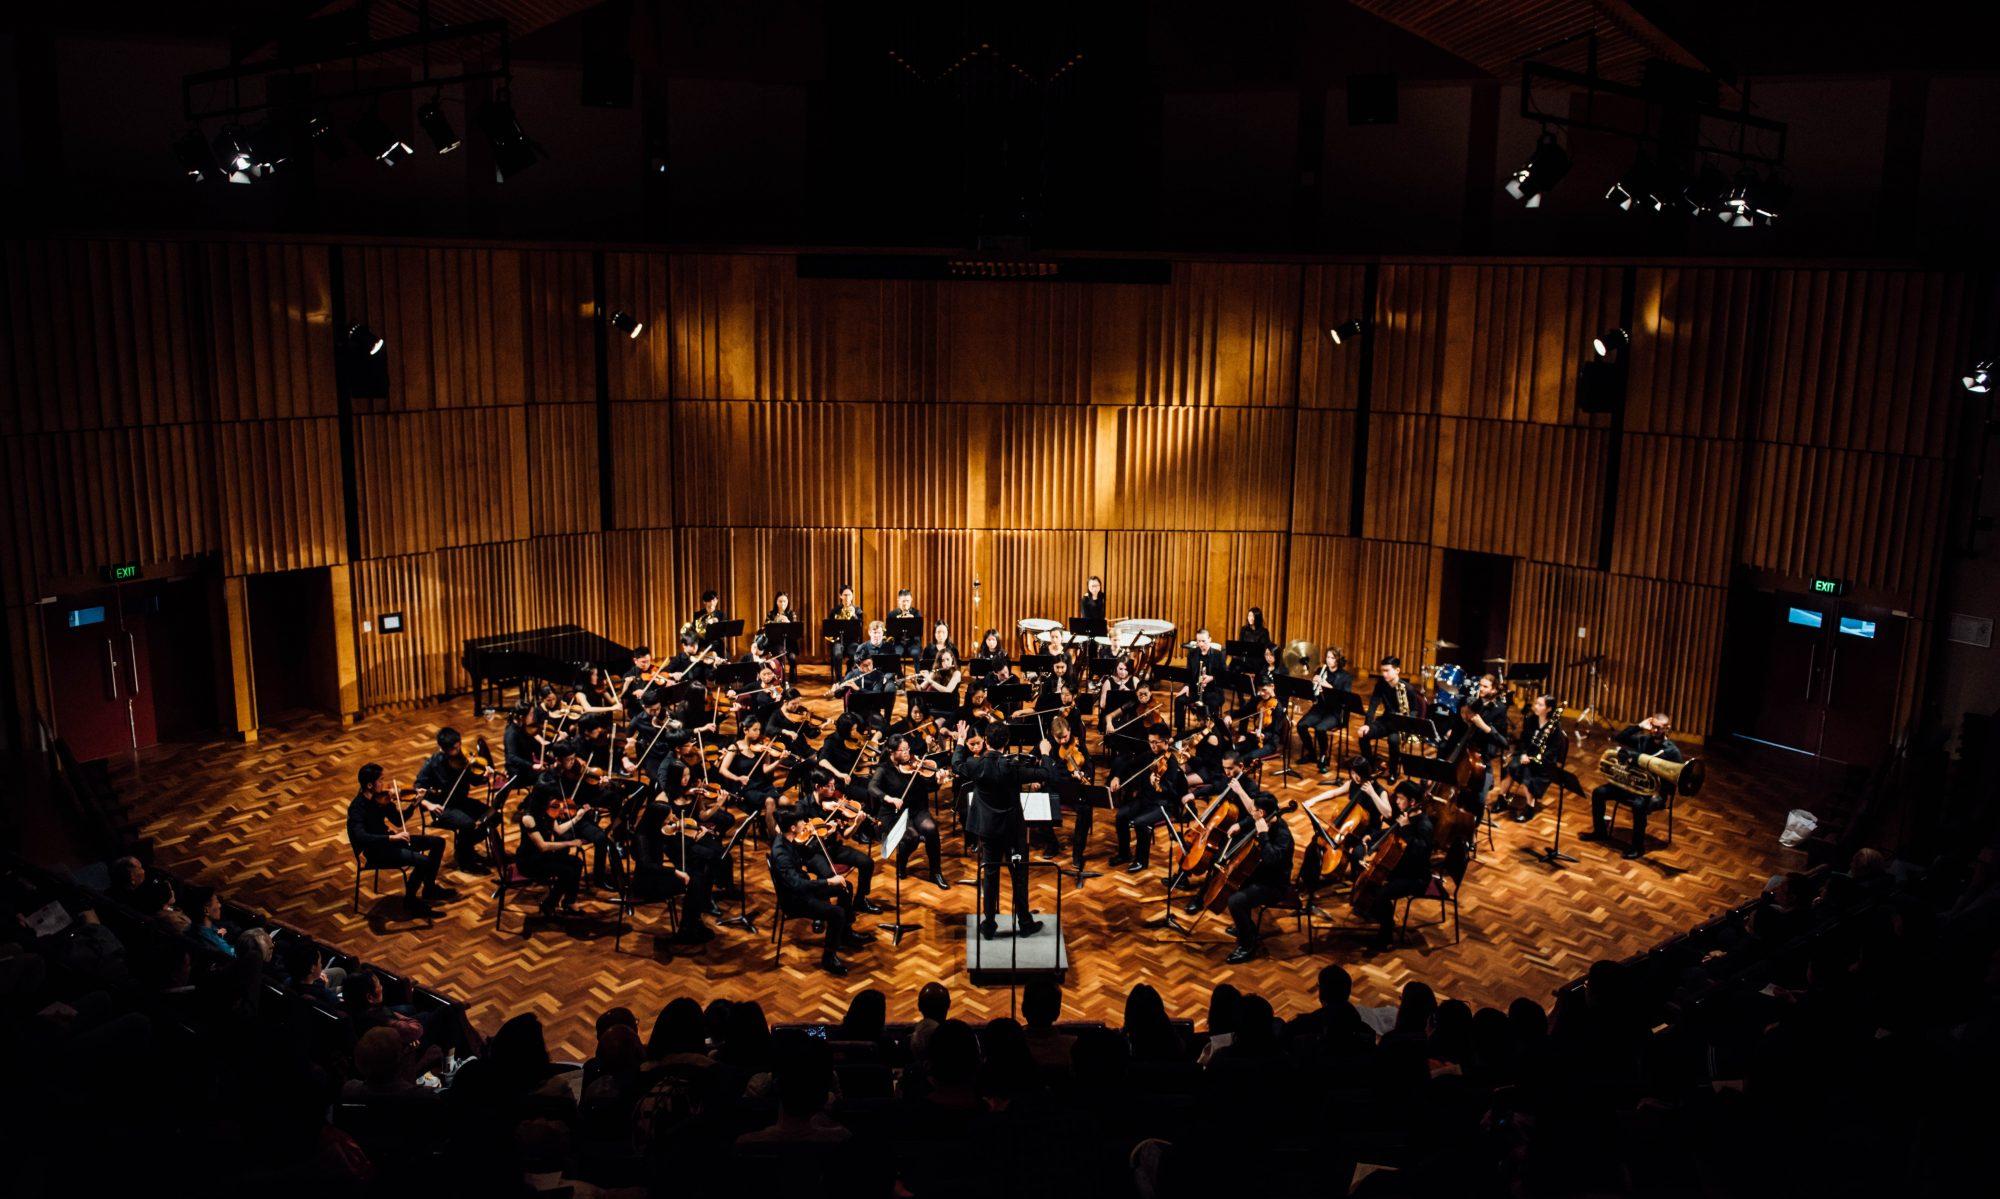 Melbourne University Biomedicine Students' Orchestra